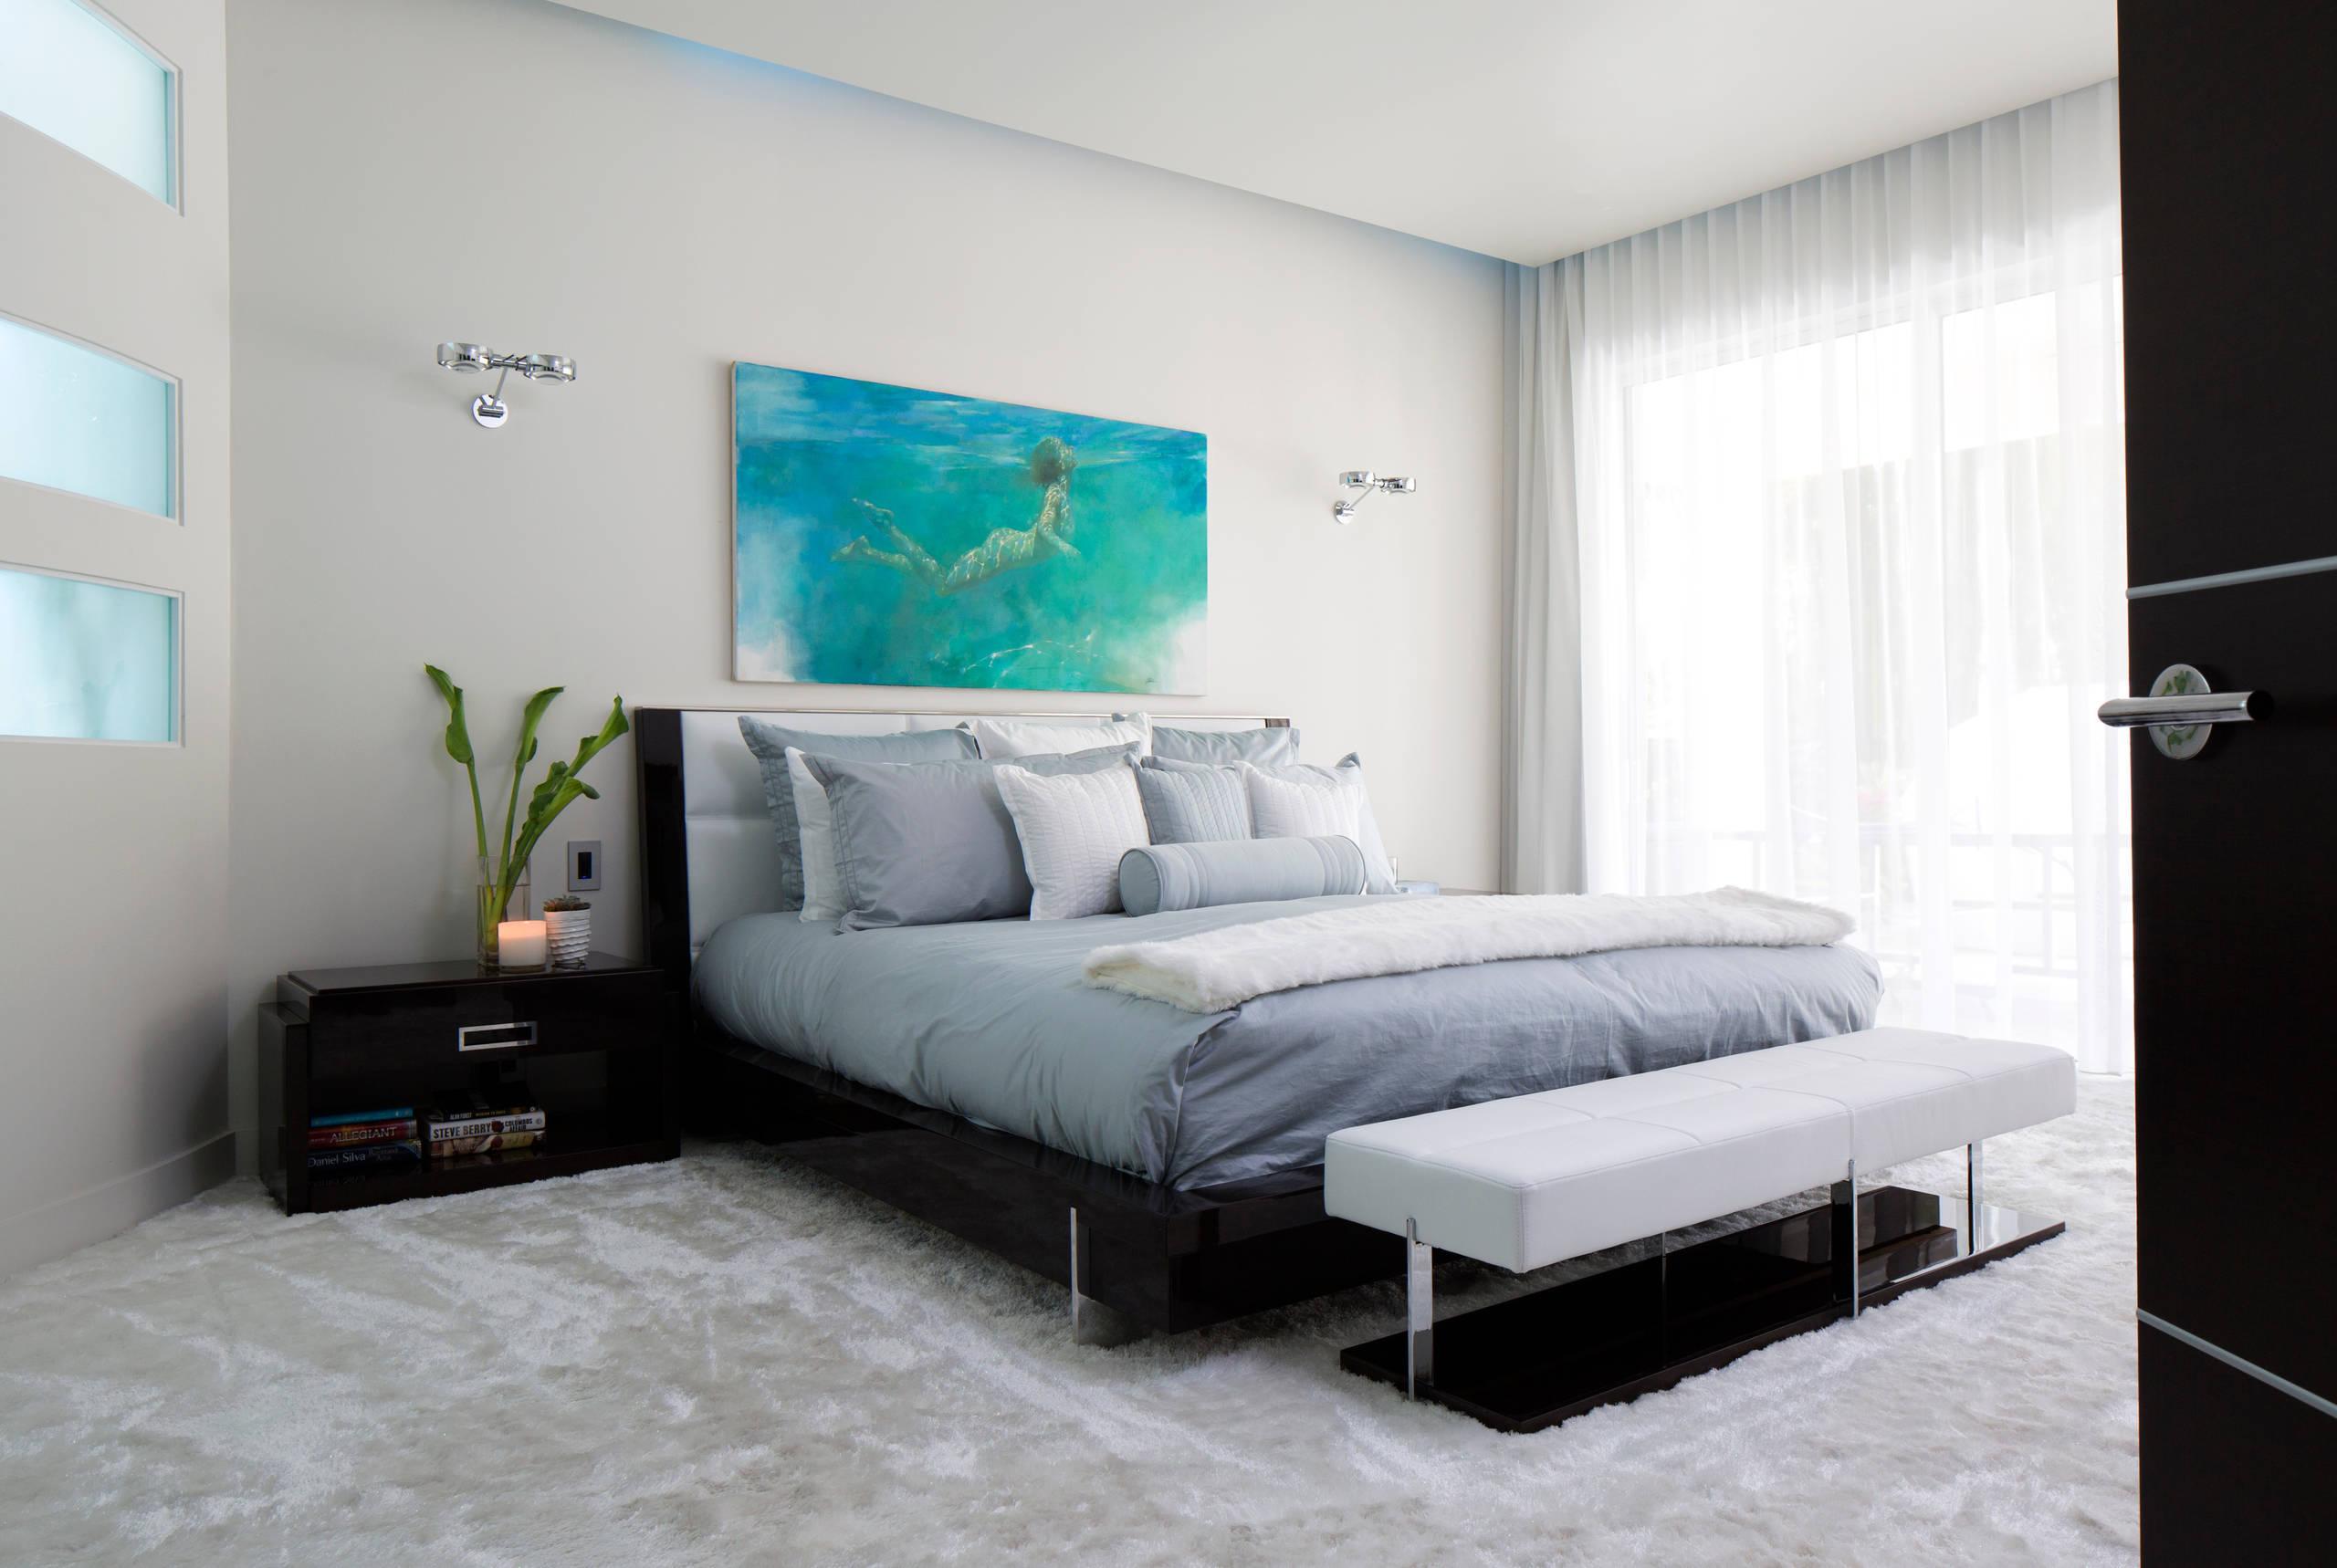 6X6 Bedroom Ideas And Photos  Houzz